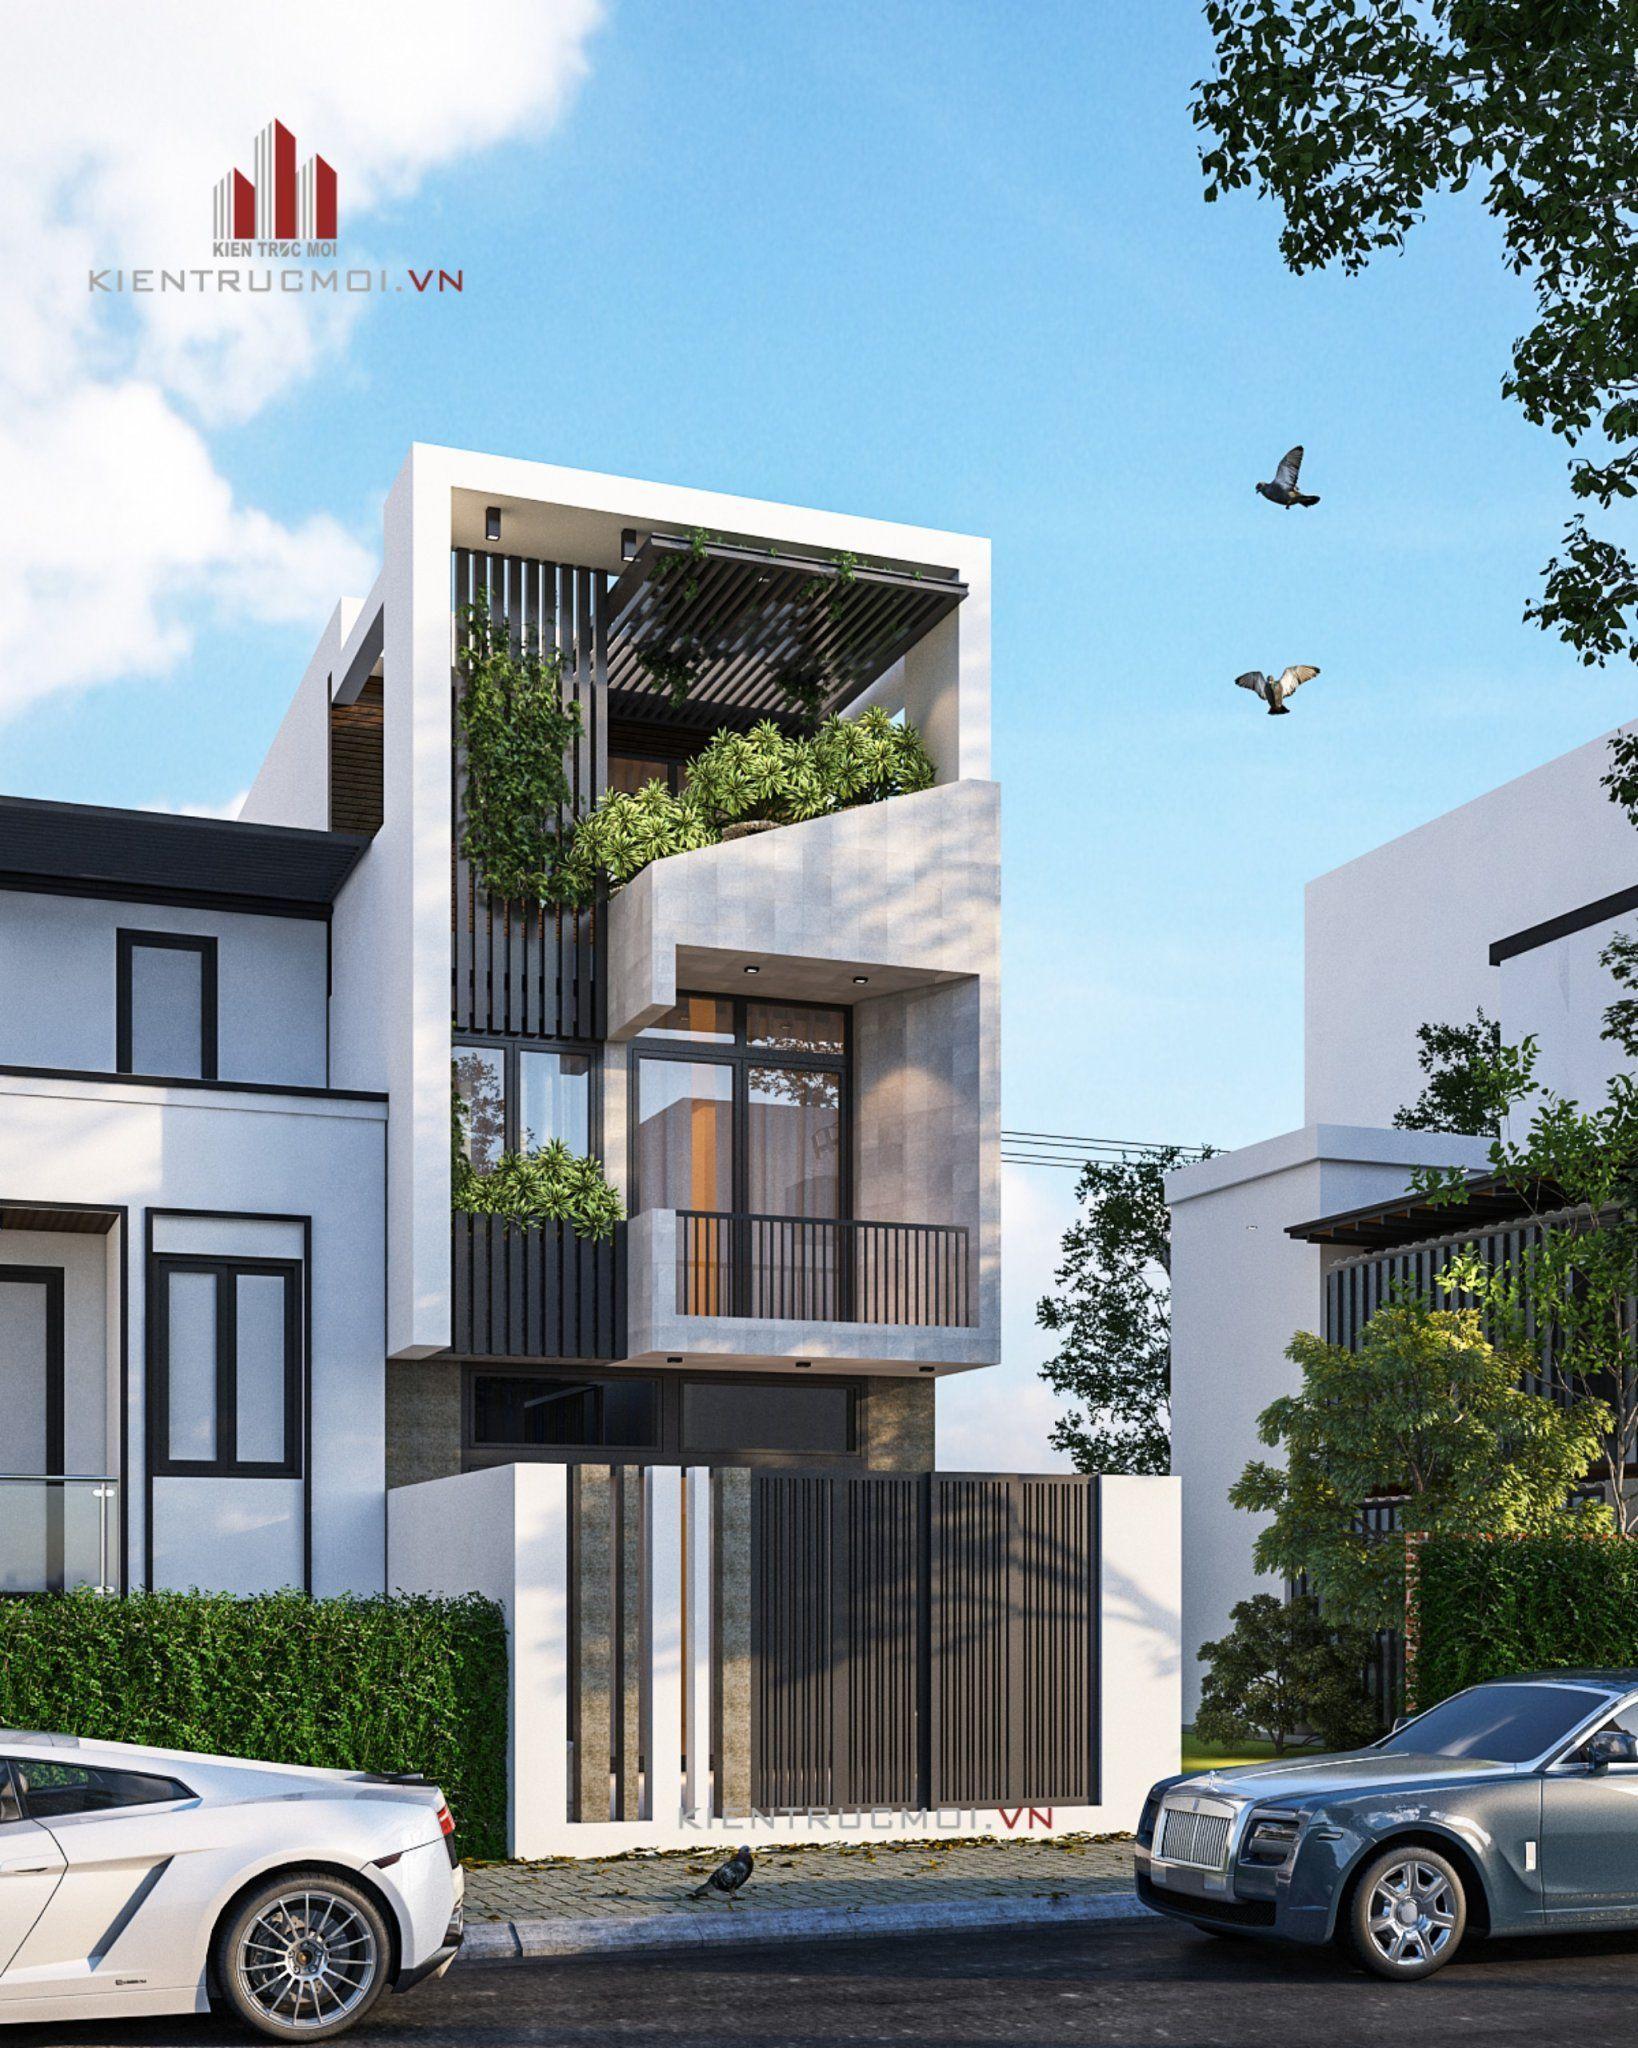 House Design Townhouse Designs House Designs Exterior